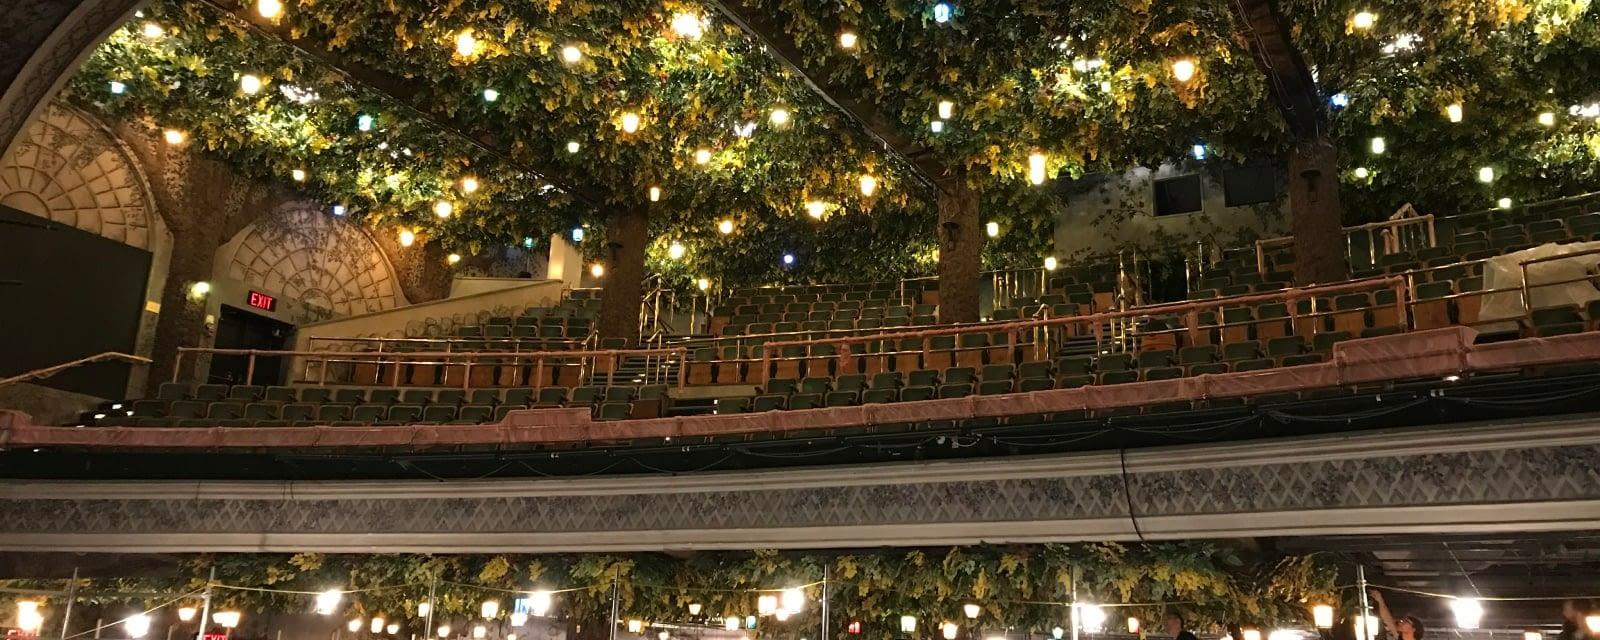 Expertise - The interior balcony of Elgin & Winter Garden Theatre in Toronto, Ontario